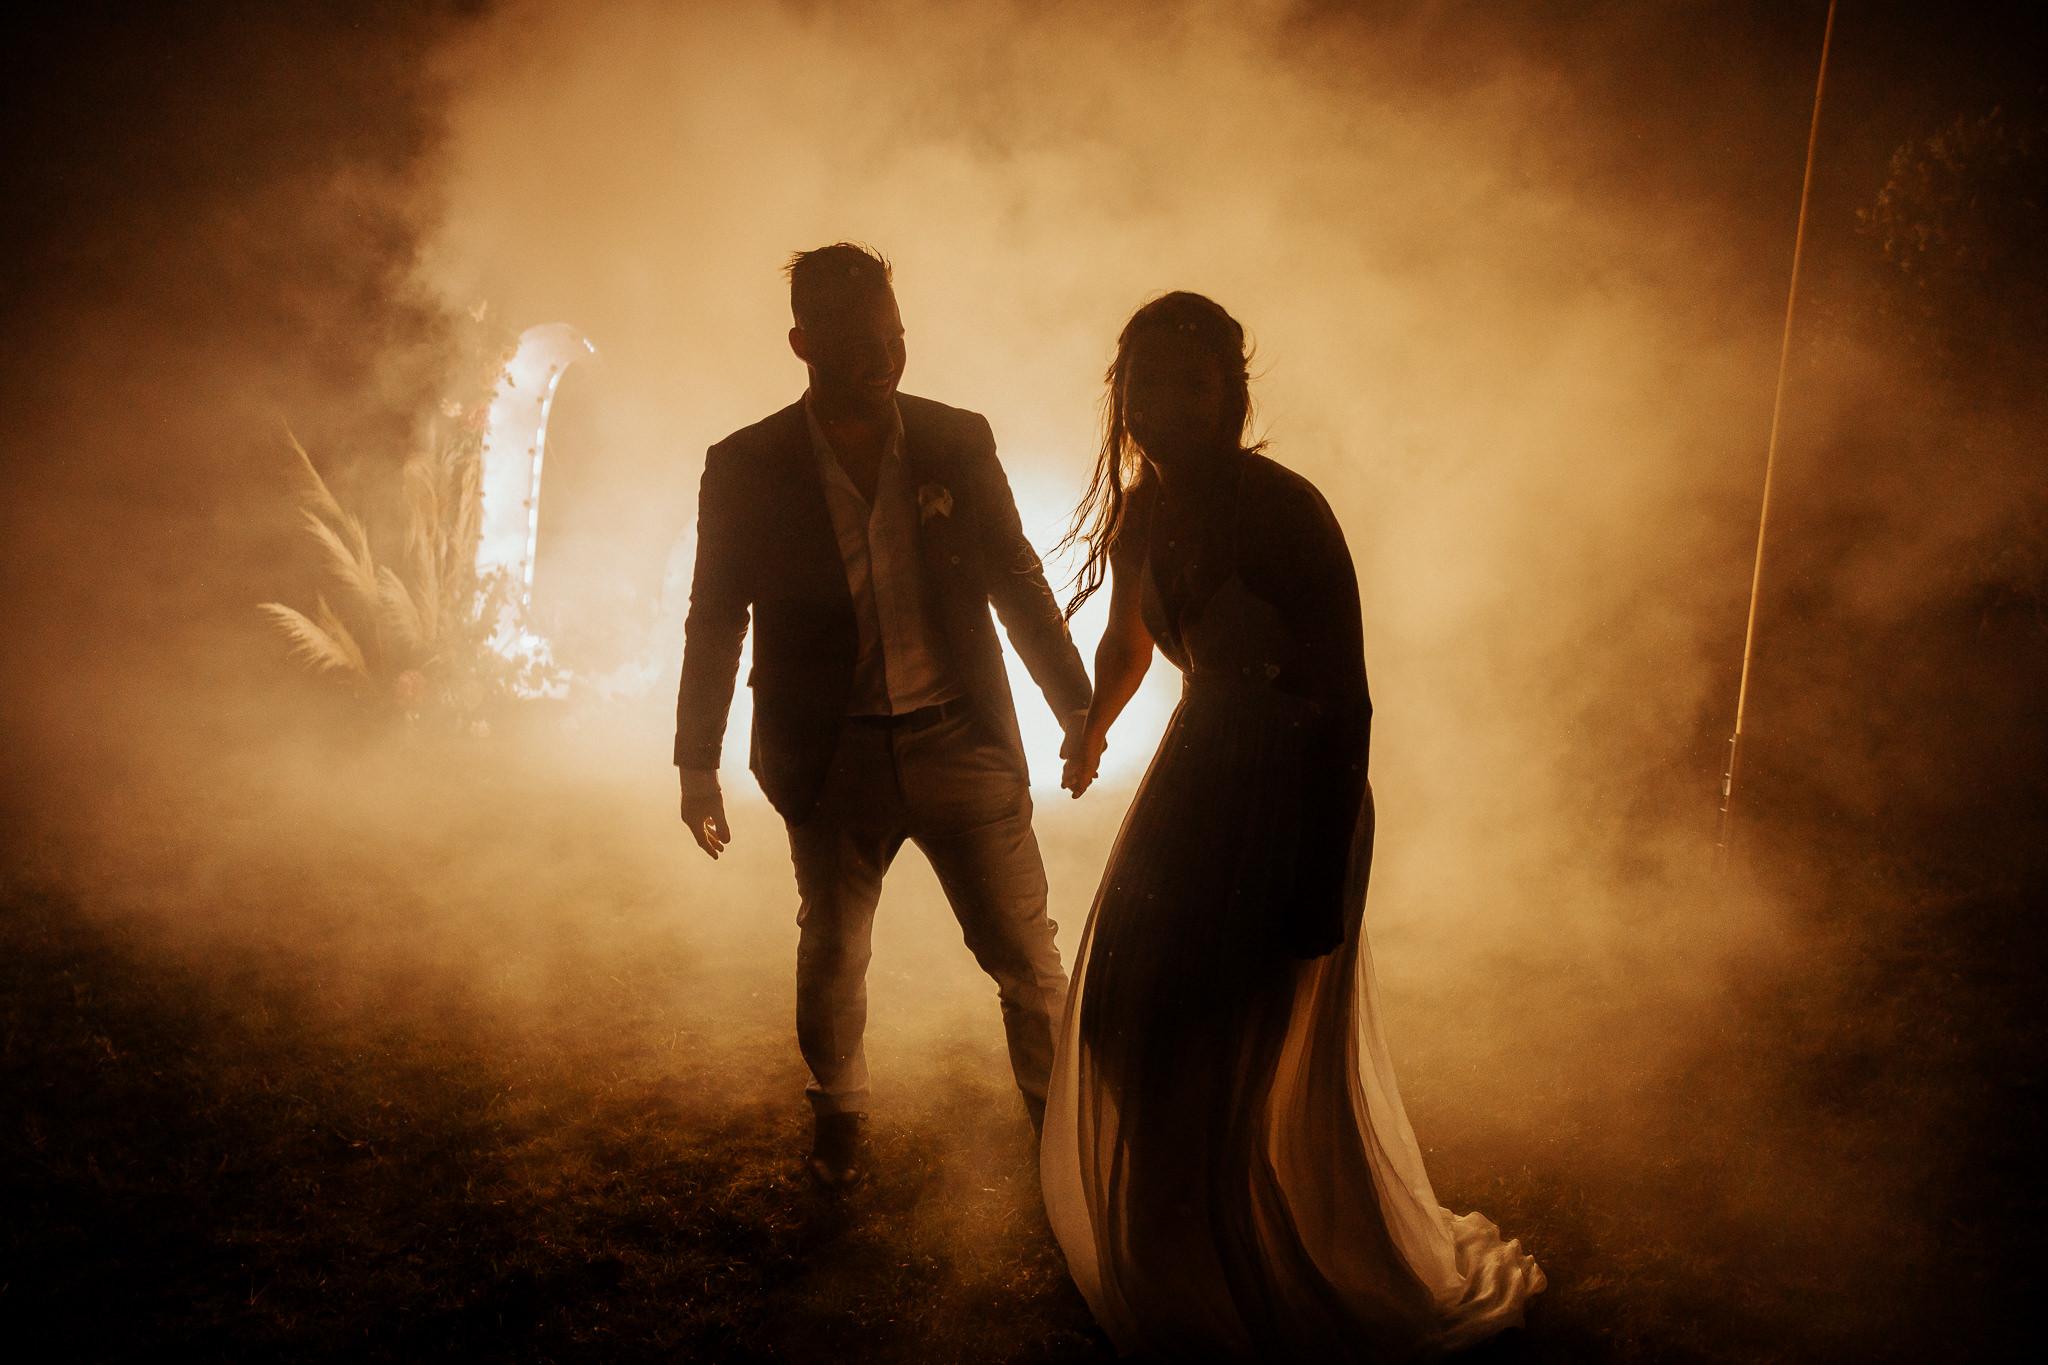 Coromandel Wedding Photographer - Hollow & Co